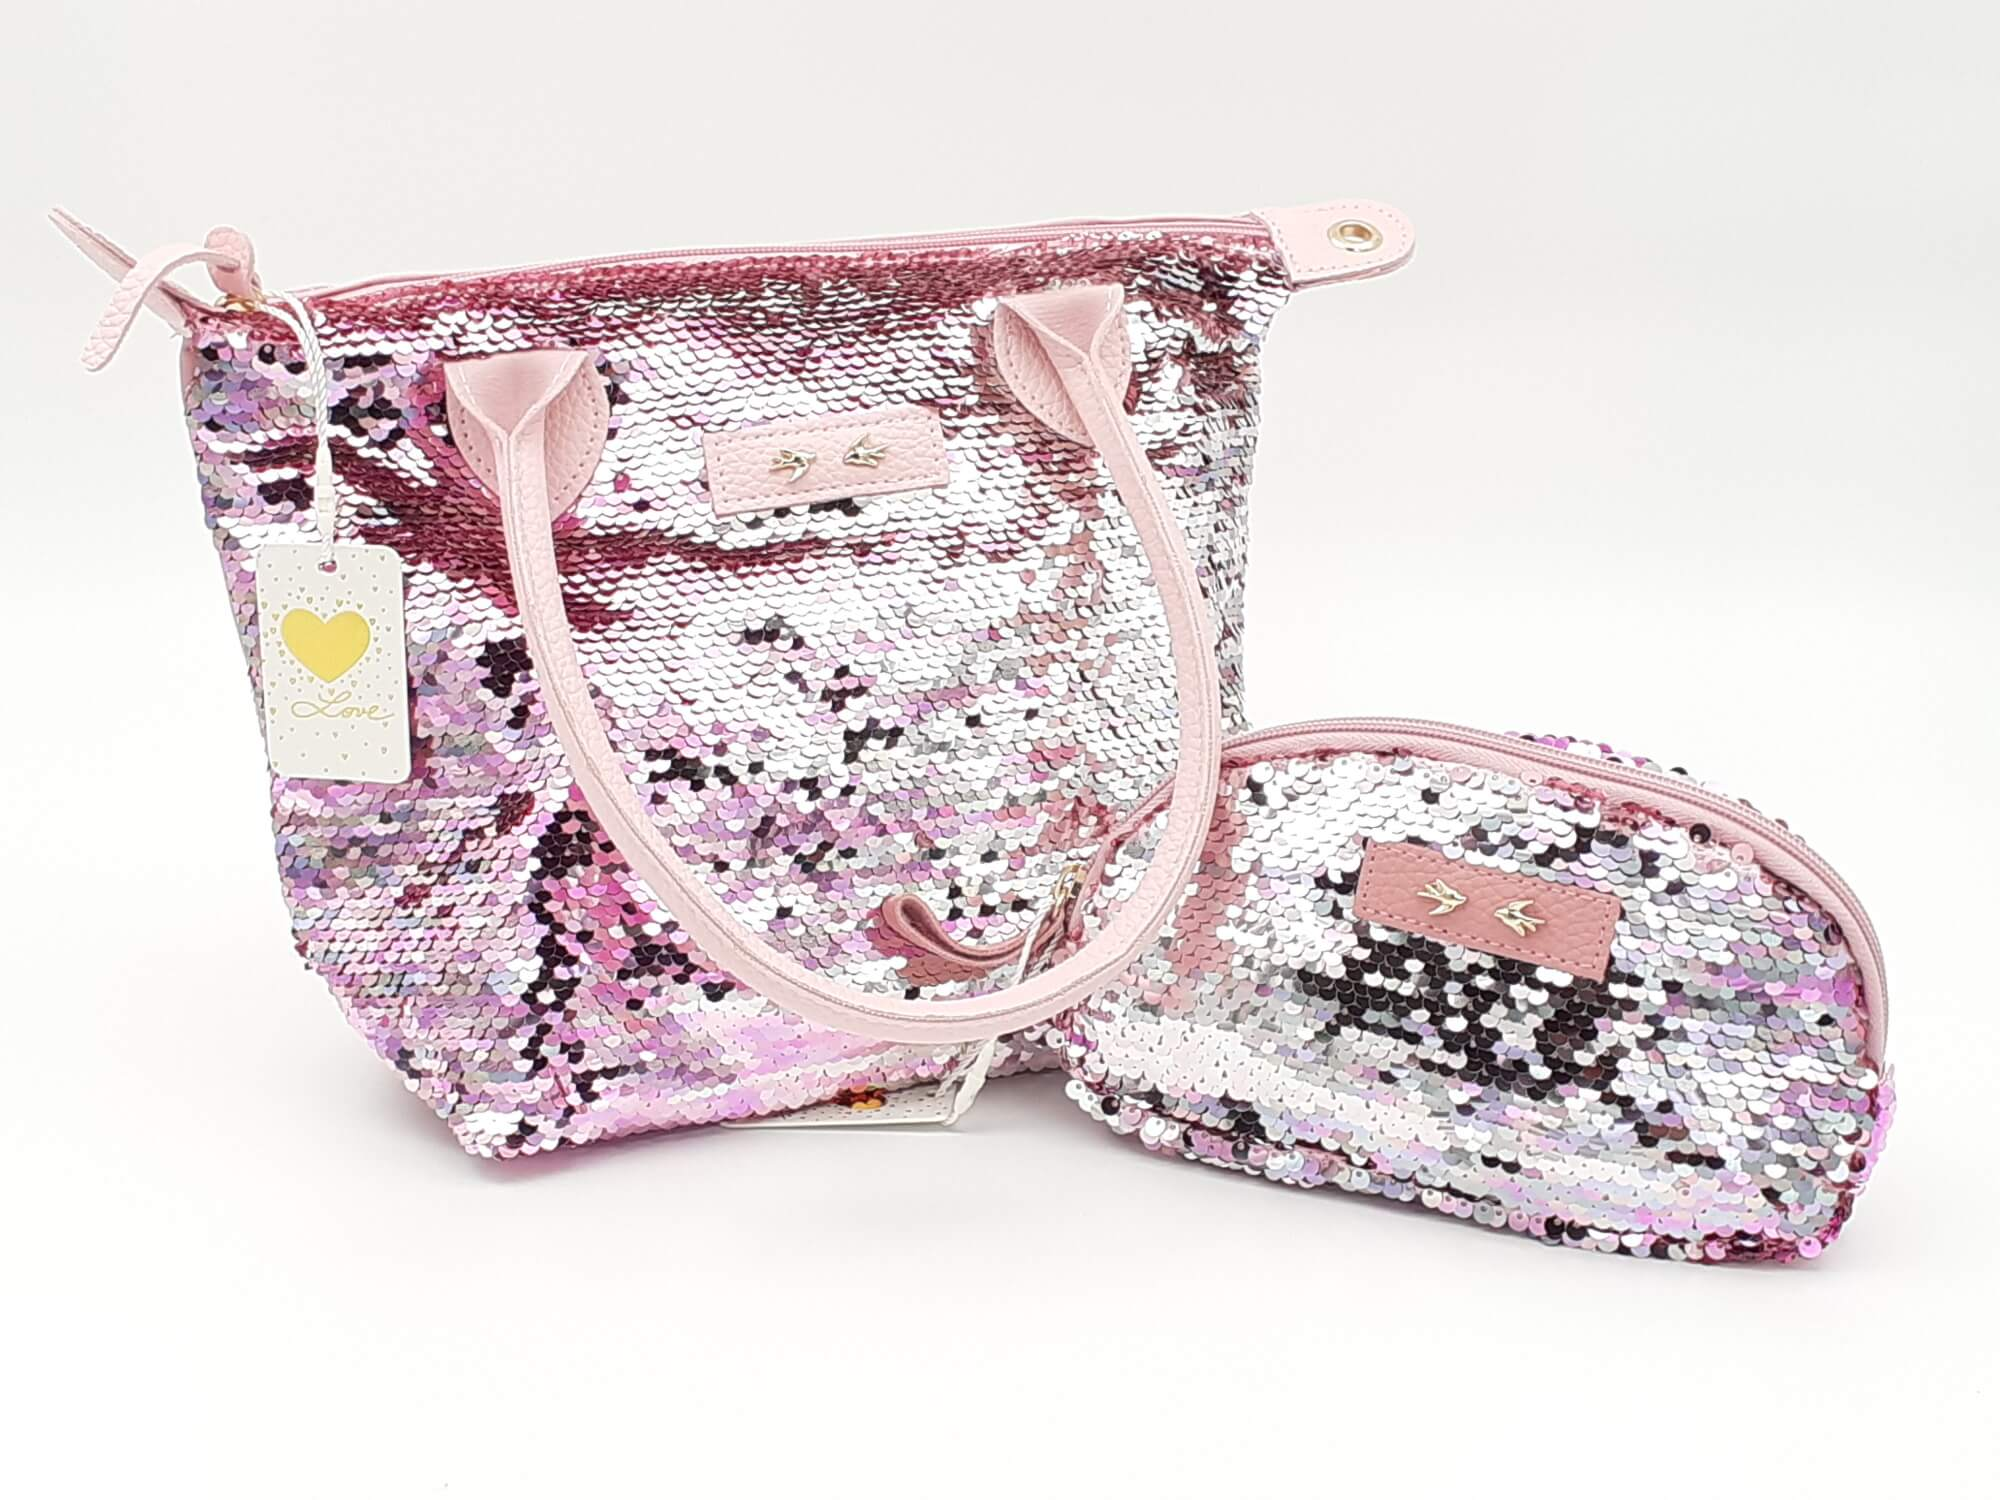 Depesche Trend Love roze torba i neseser SET sa šljokicama